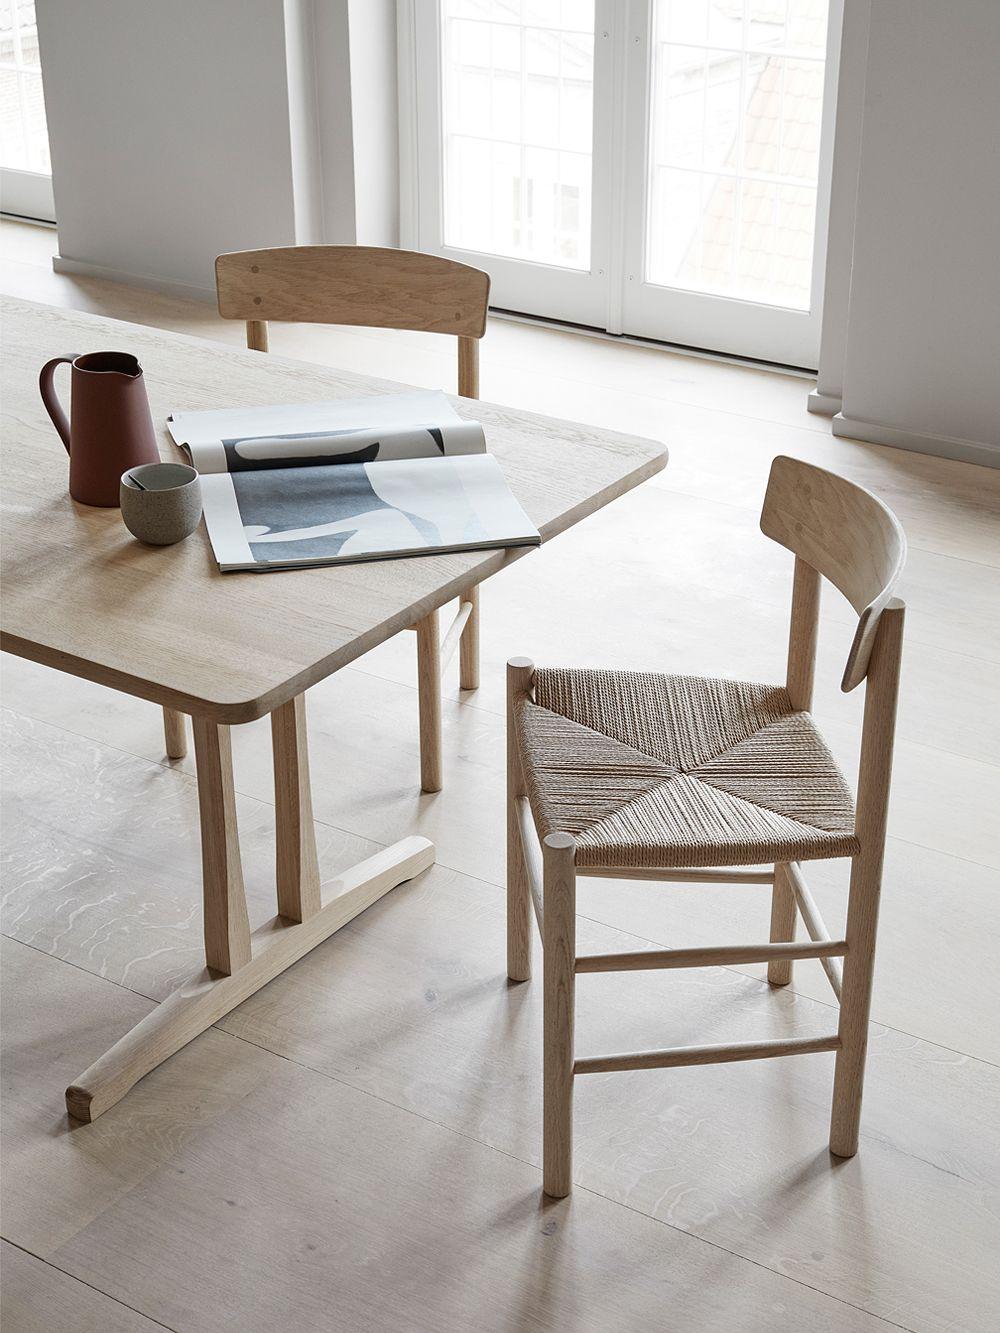 Frederician J39-tuoli